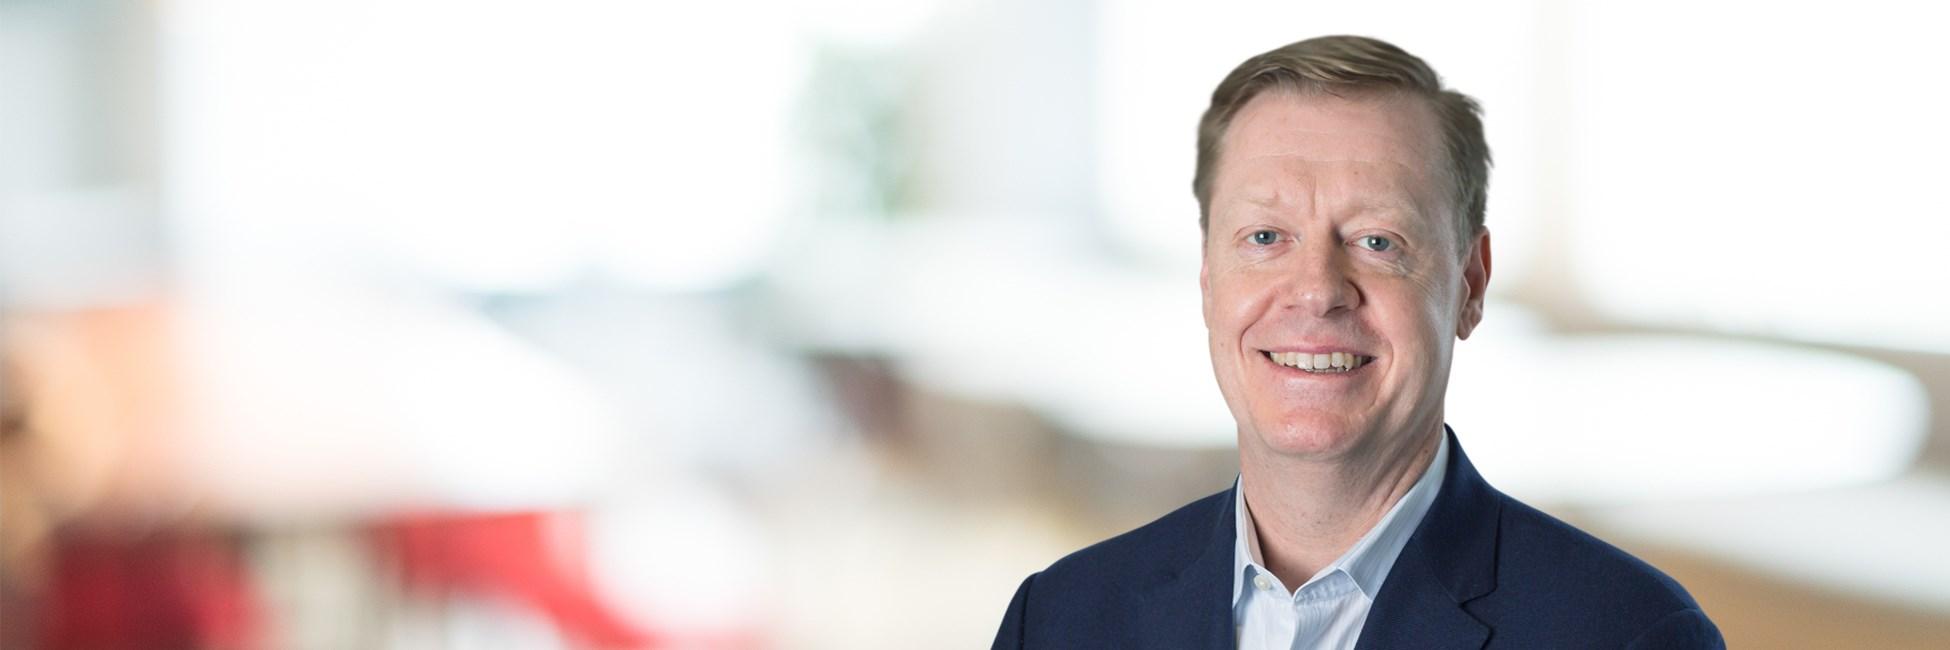 Steve McLaughlin — Management Consultant - Bain & Company